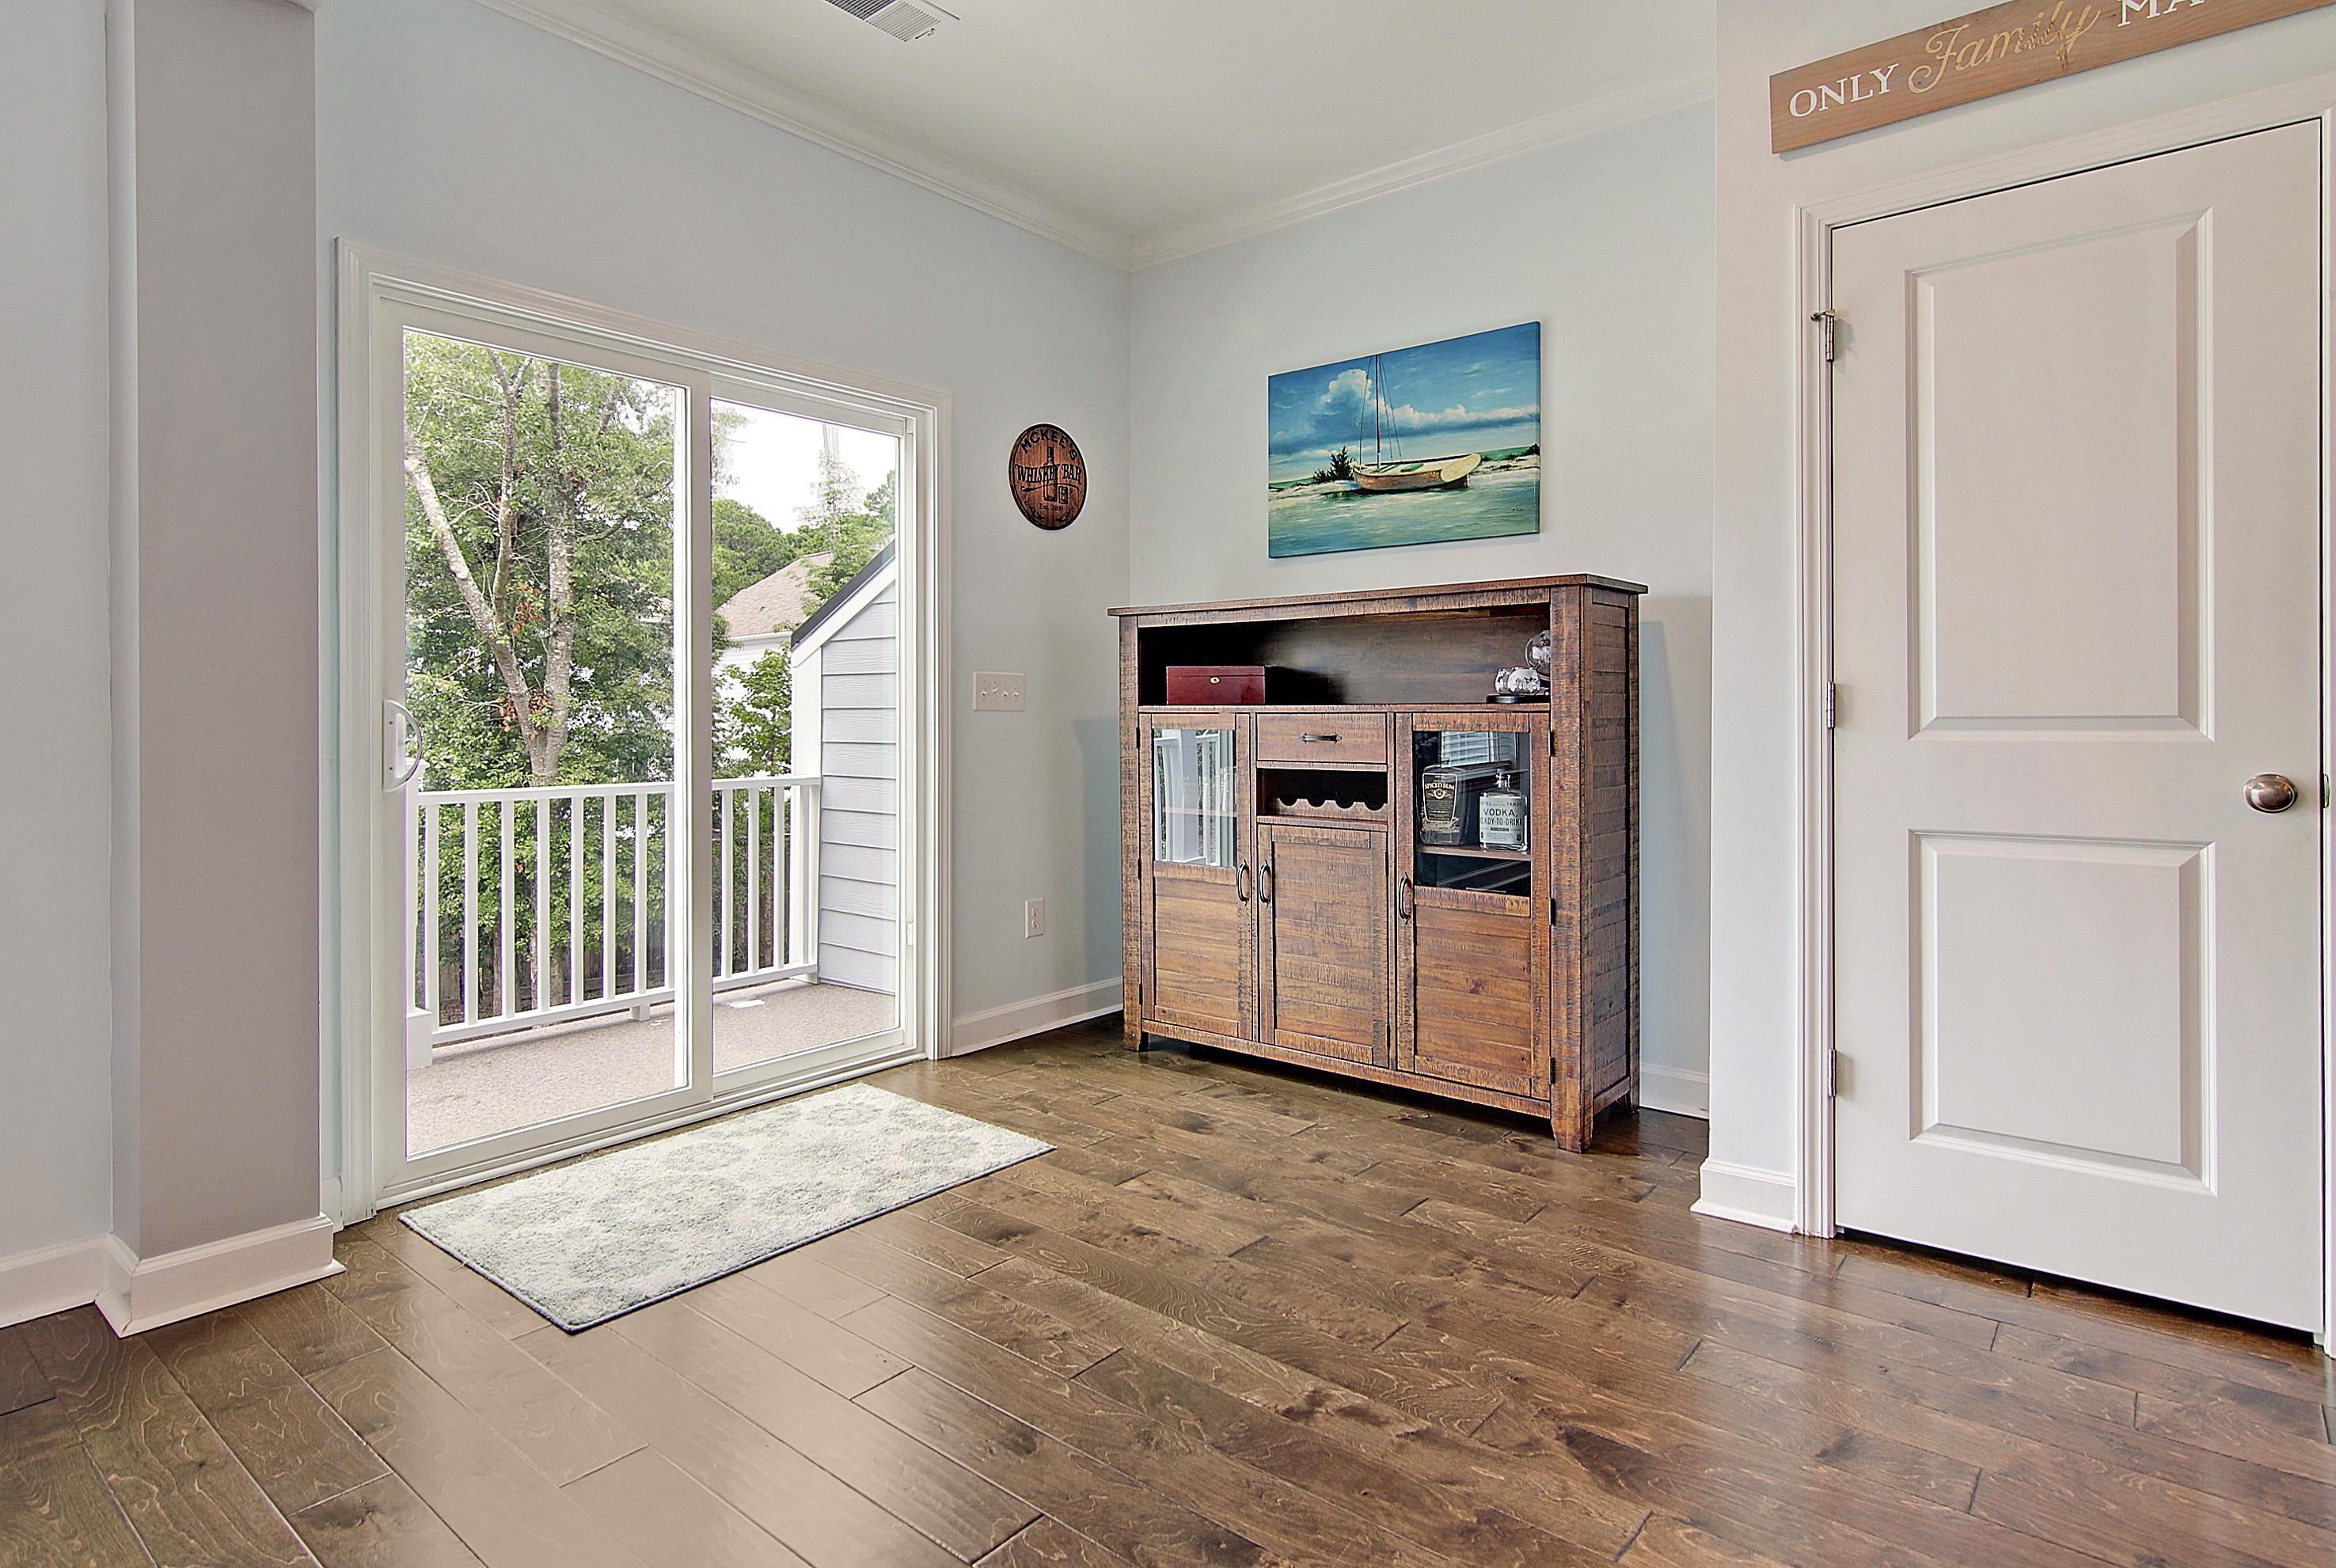 Park West Homes For Sale - 1551 Moss Spring, Mount Pleasant, SC - 51